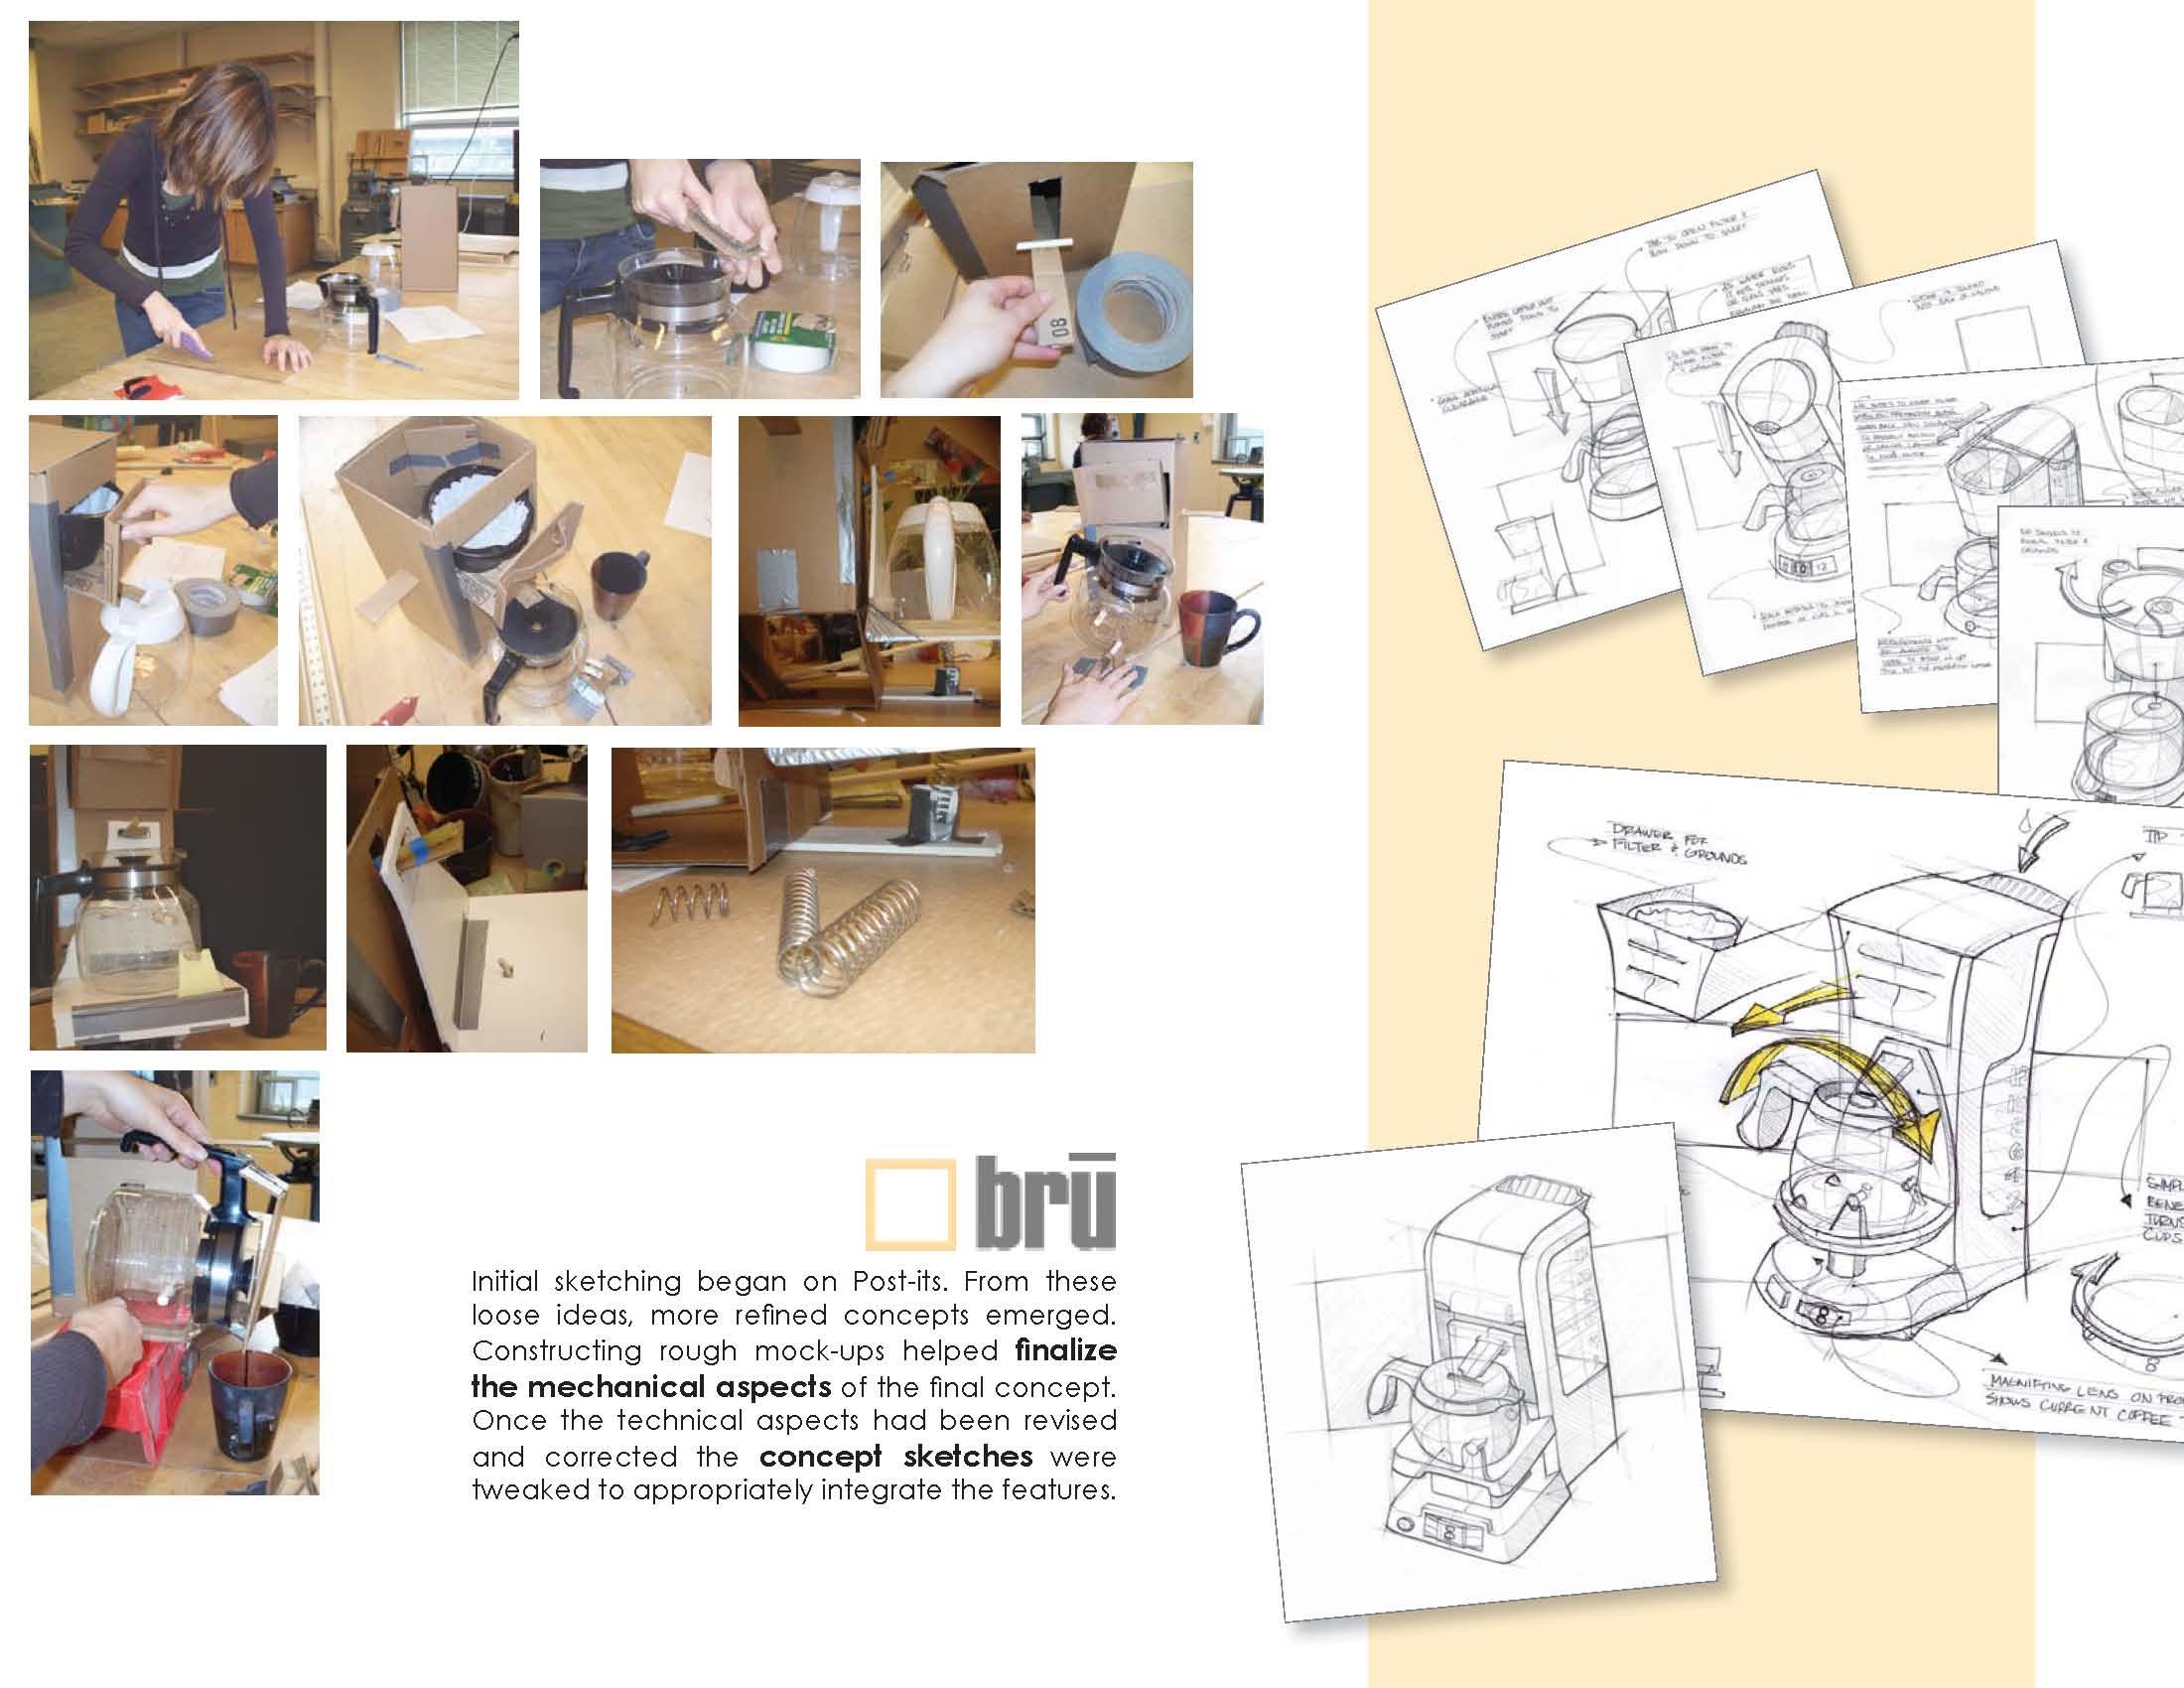 Coffee Maker In Jordan : Bru Coffee Maker by Jordan Bailey at Coroflot.com